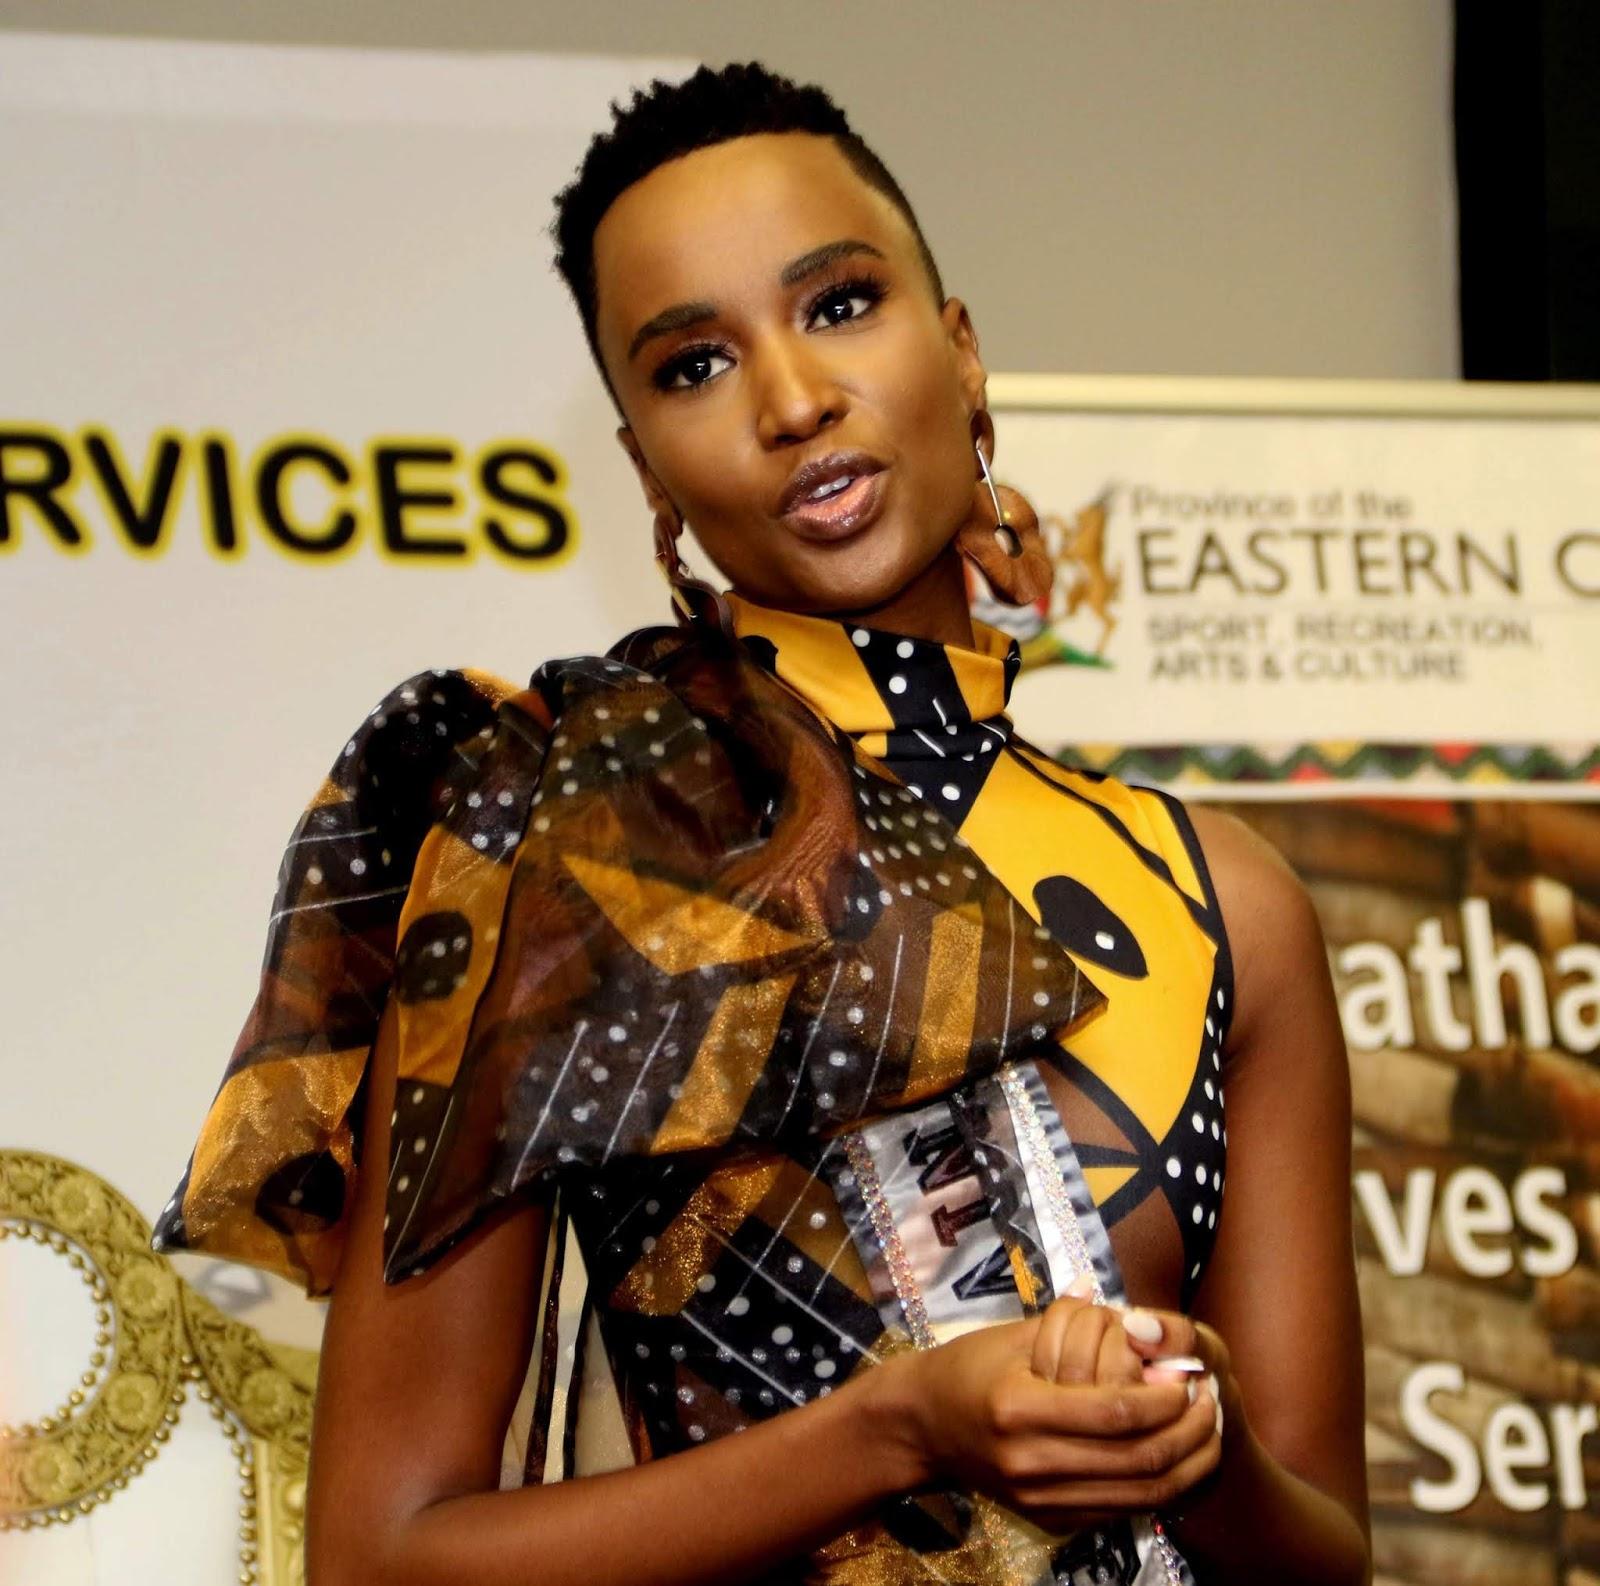 #FairnessFirst: Sona 2020, The AU, Miss Universe Pledge To Empower Women